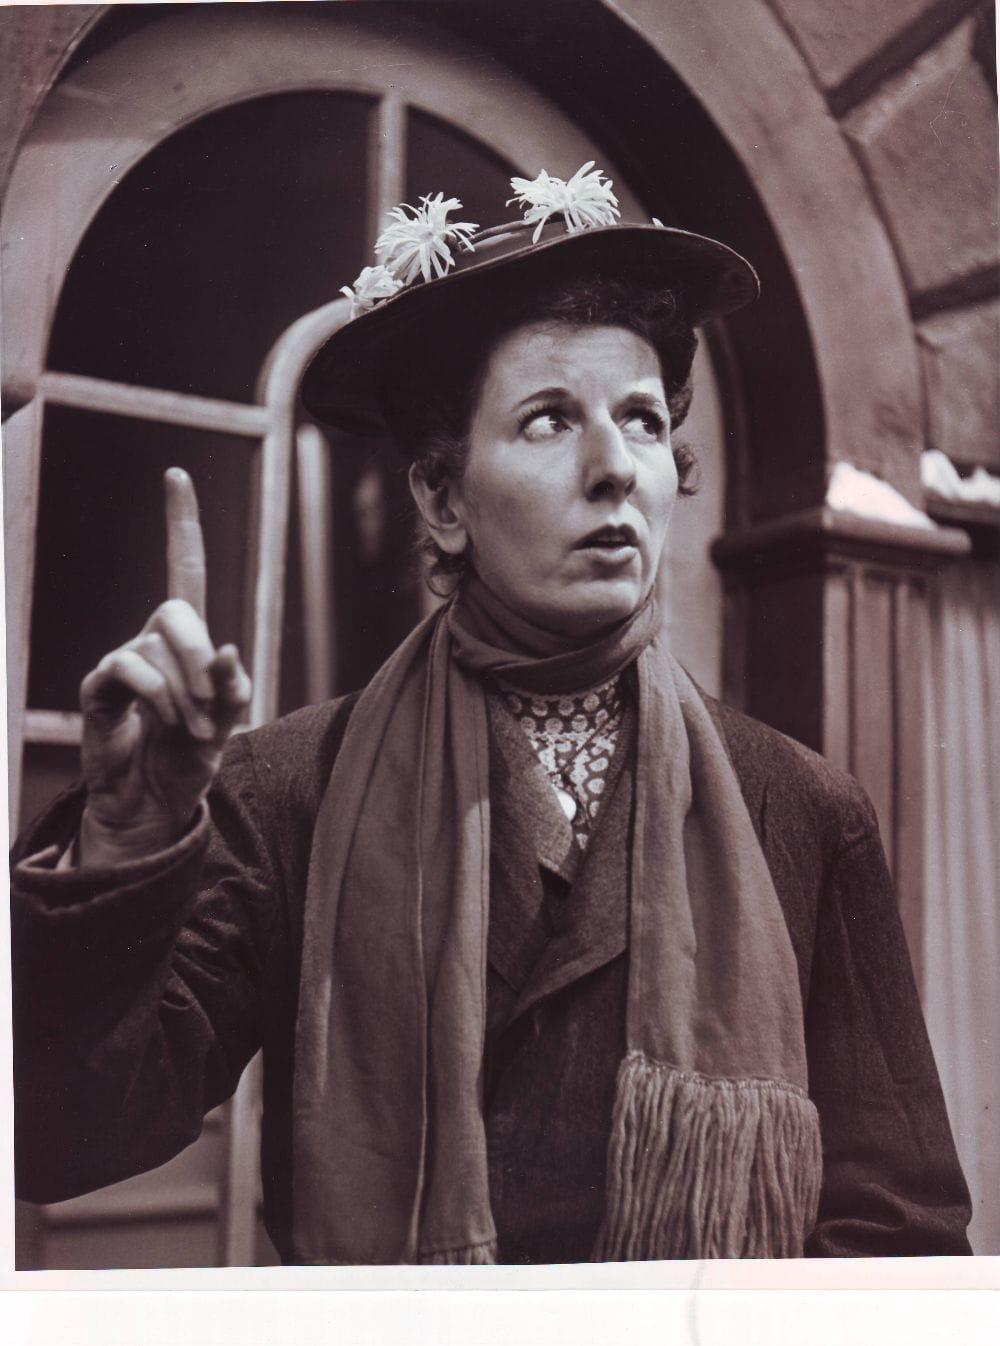 Communication on this topic: Andrea Mason (actress), mary-wickes/